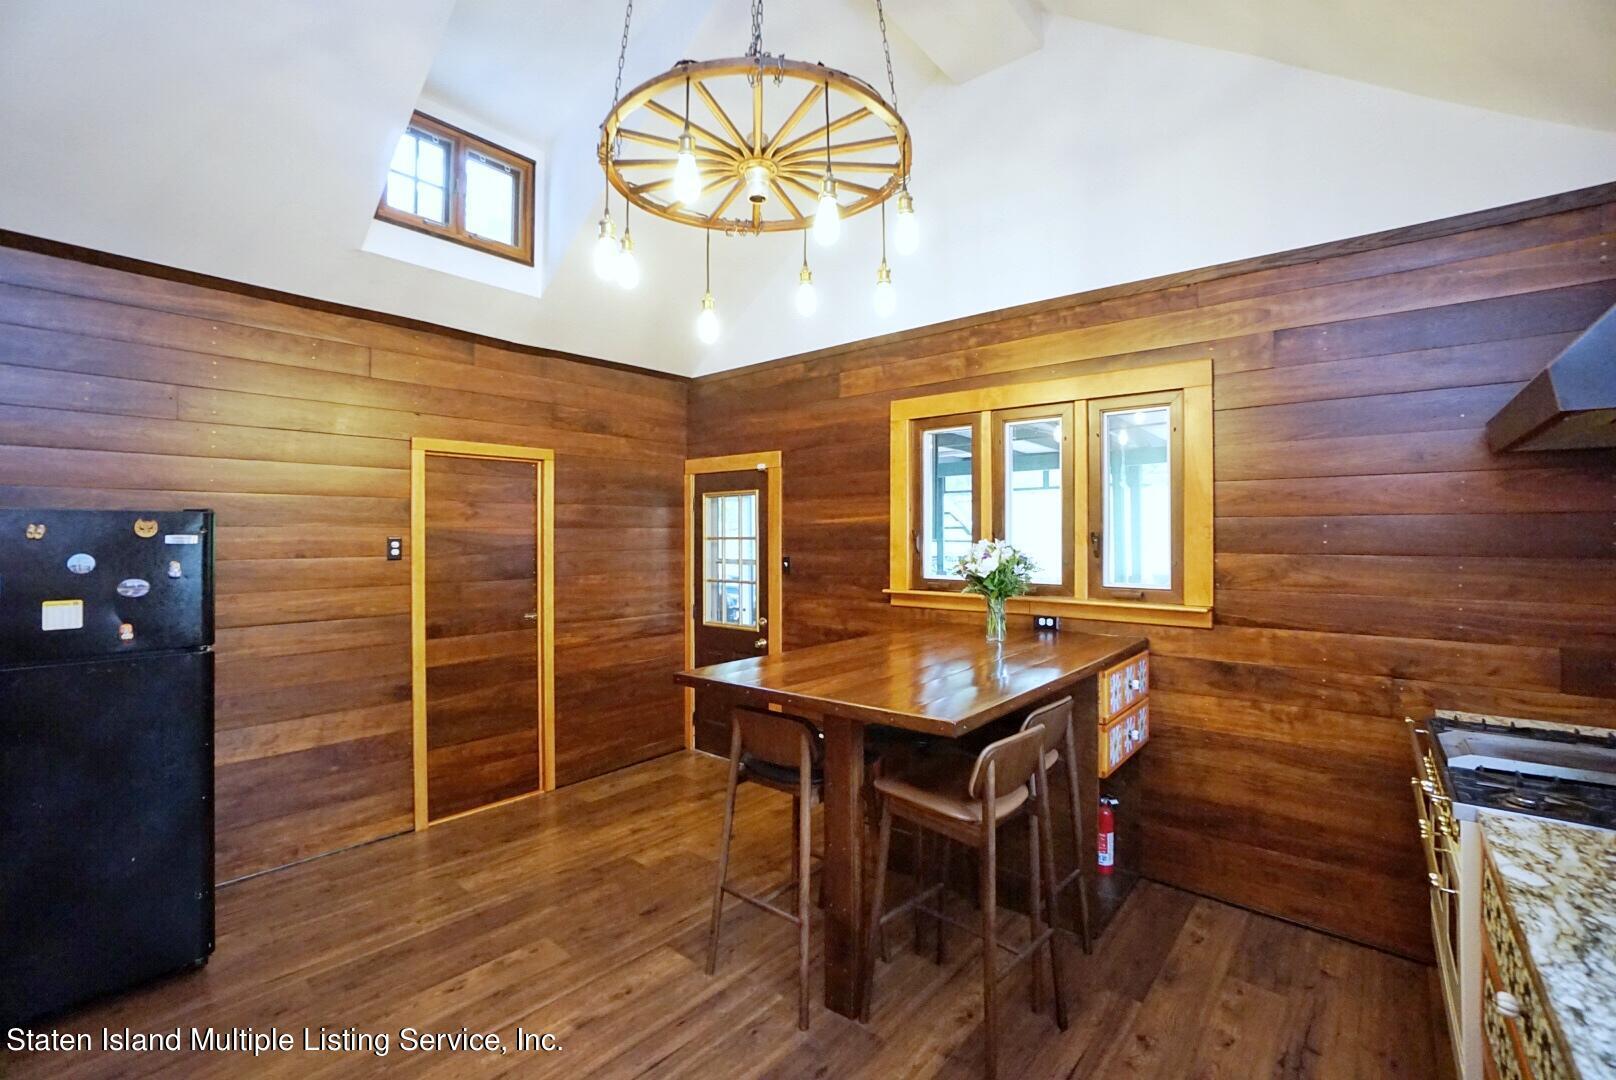 Single Family - Detached 136 York Avenue  Staten Island, NY 10301, MLS-1147575-15